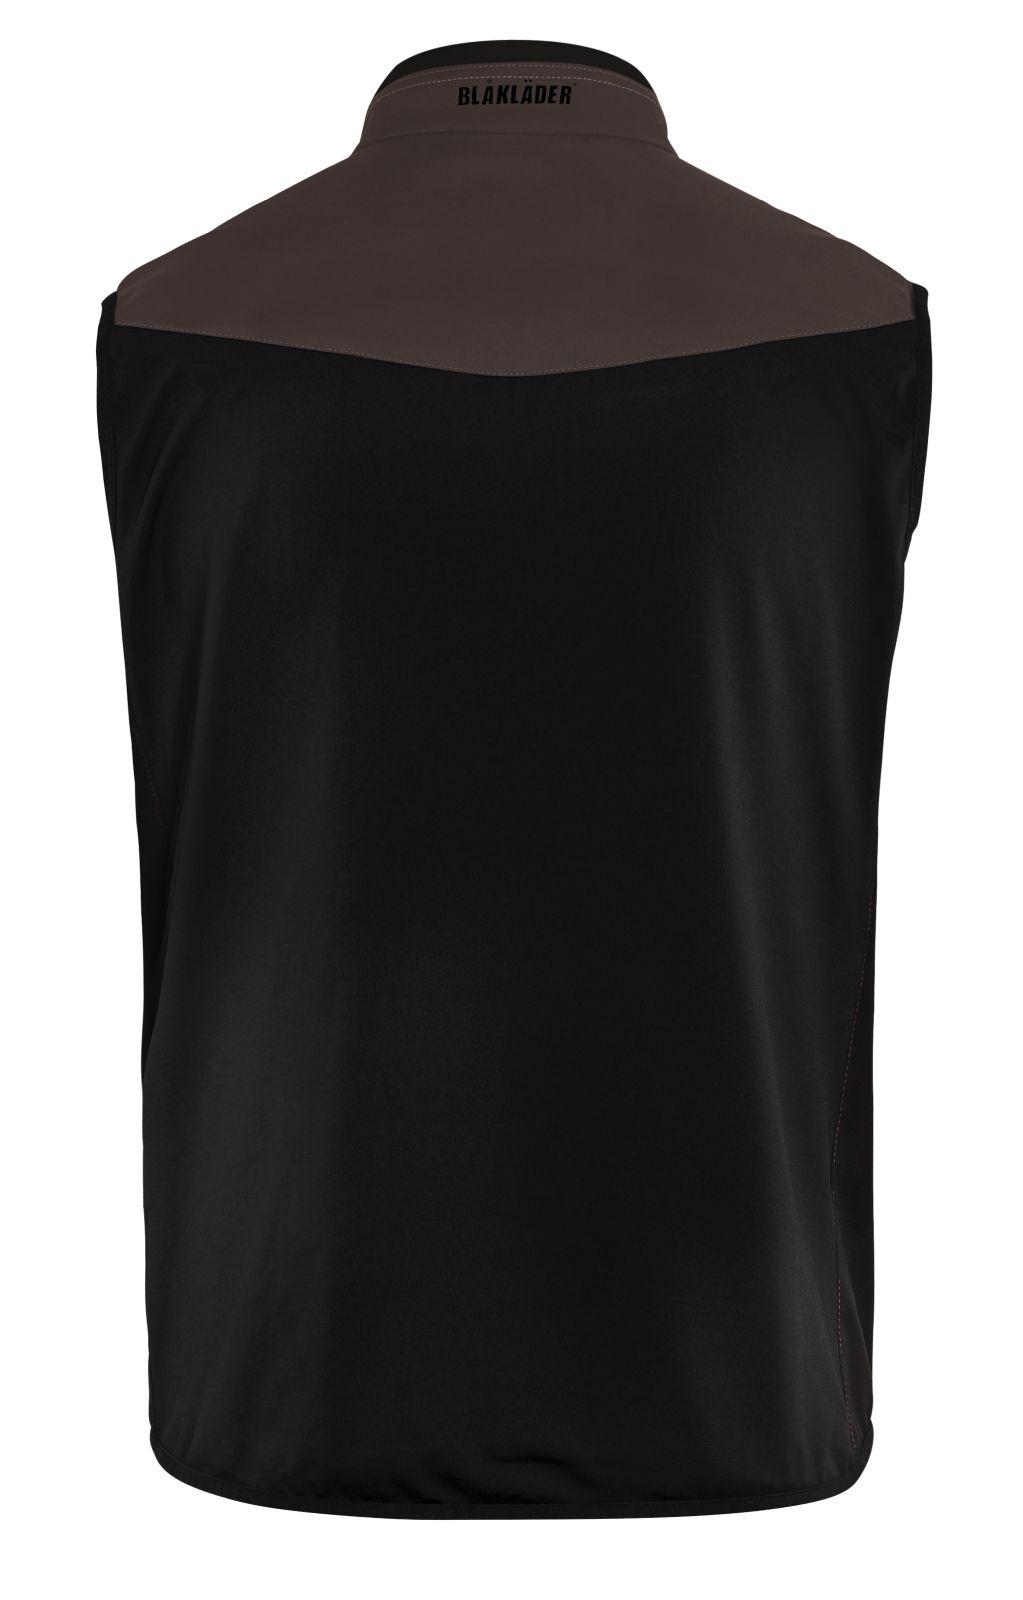 Blaklader Softshell bodywarmers 38502516 bruin-zwart(7899)